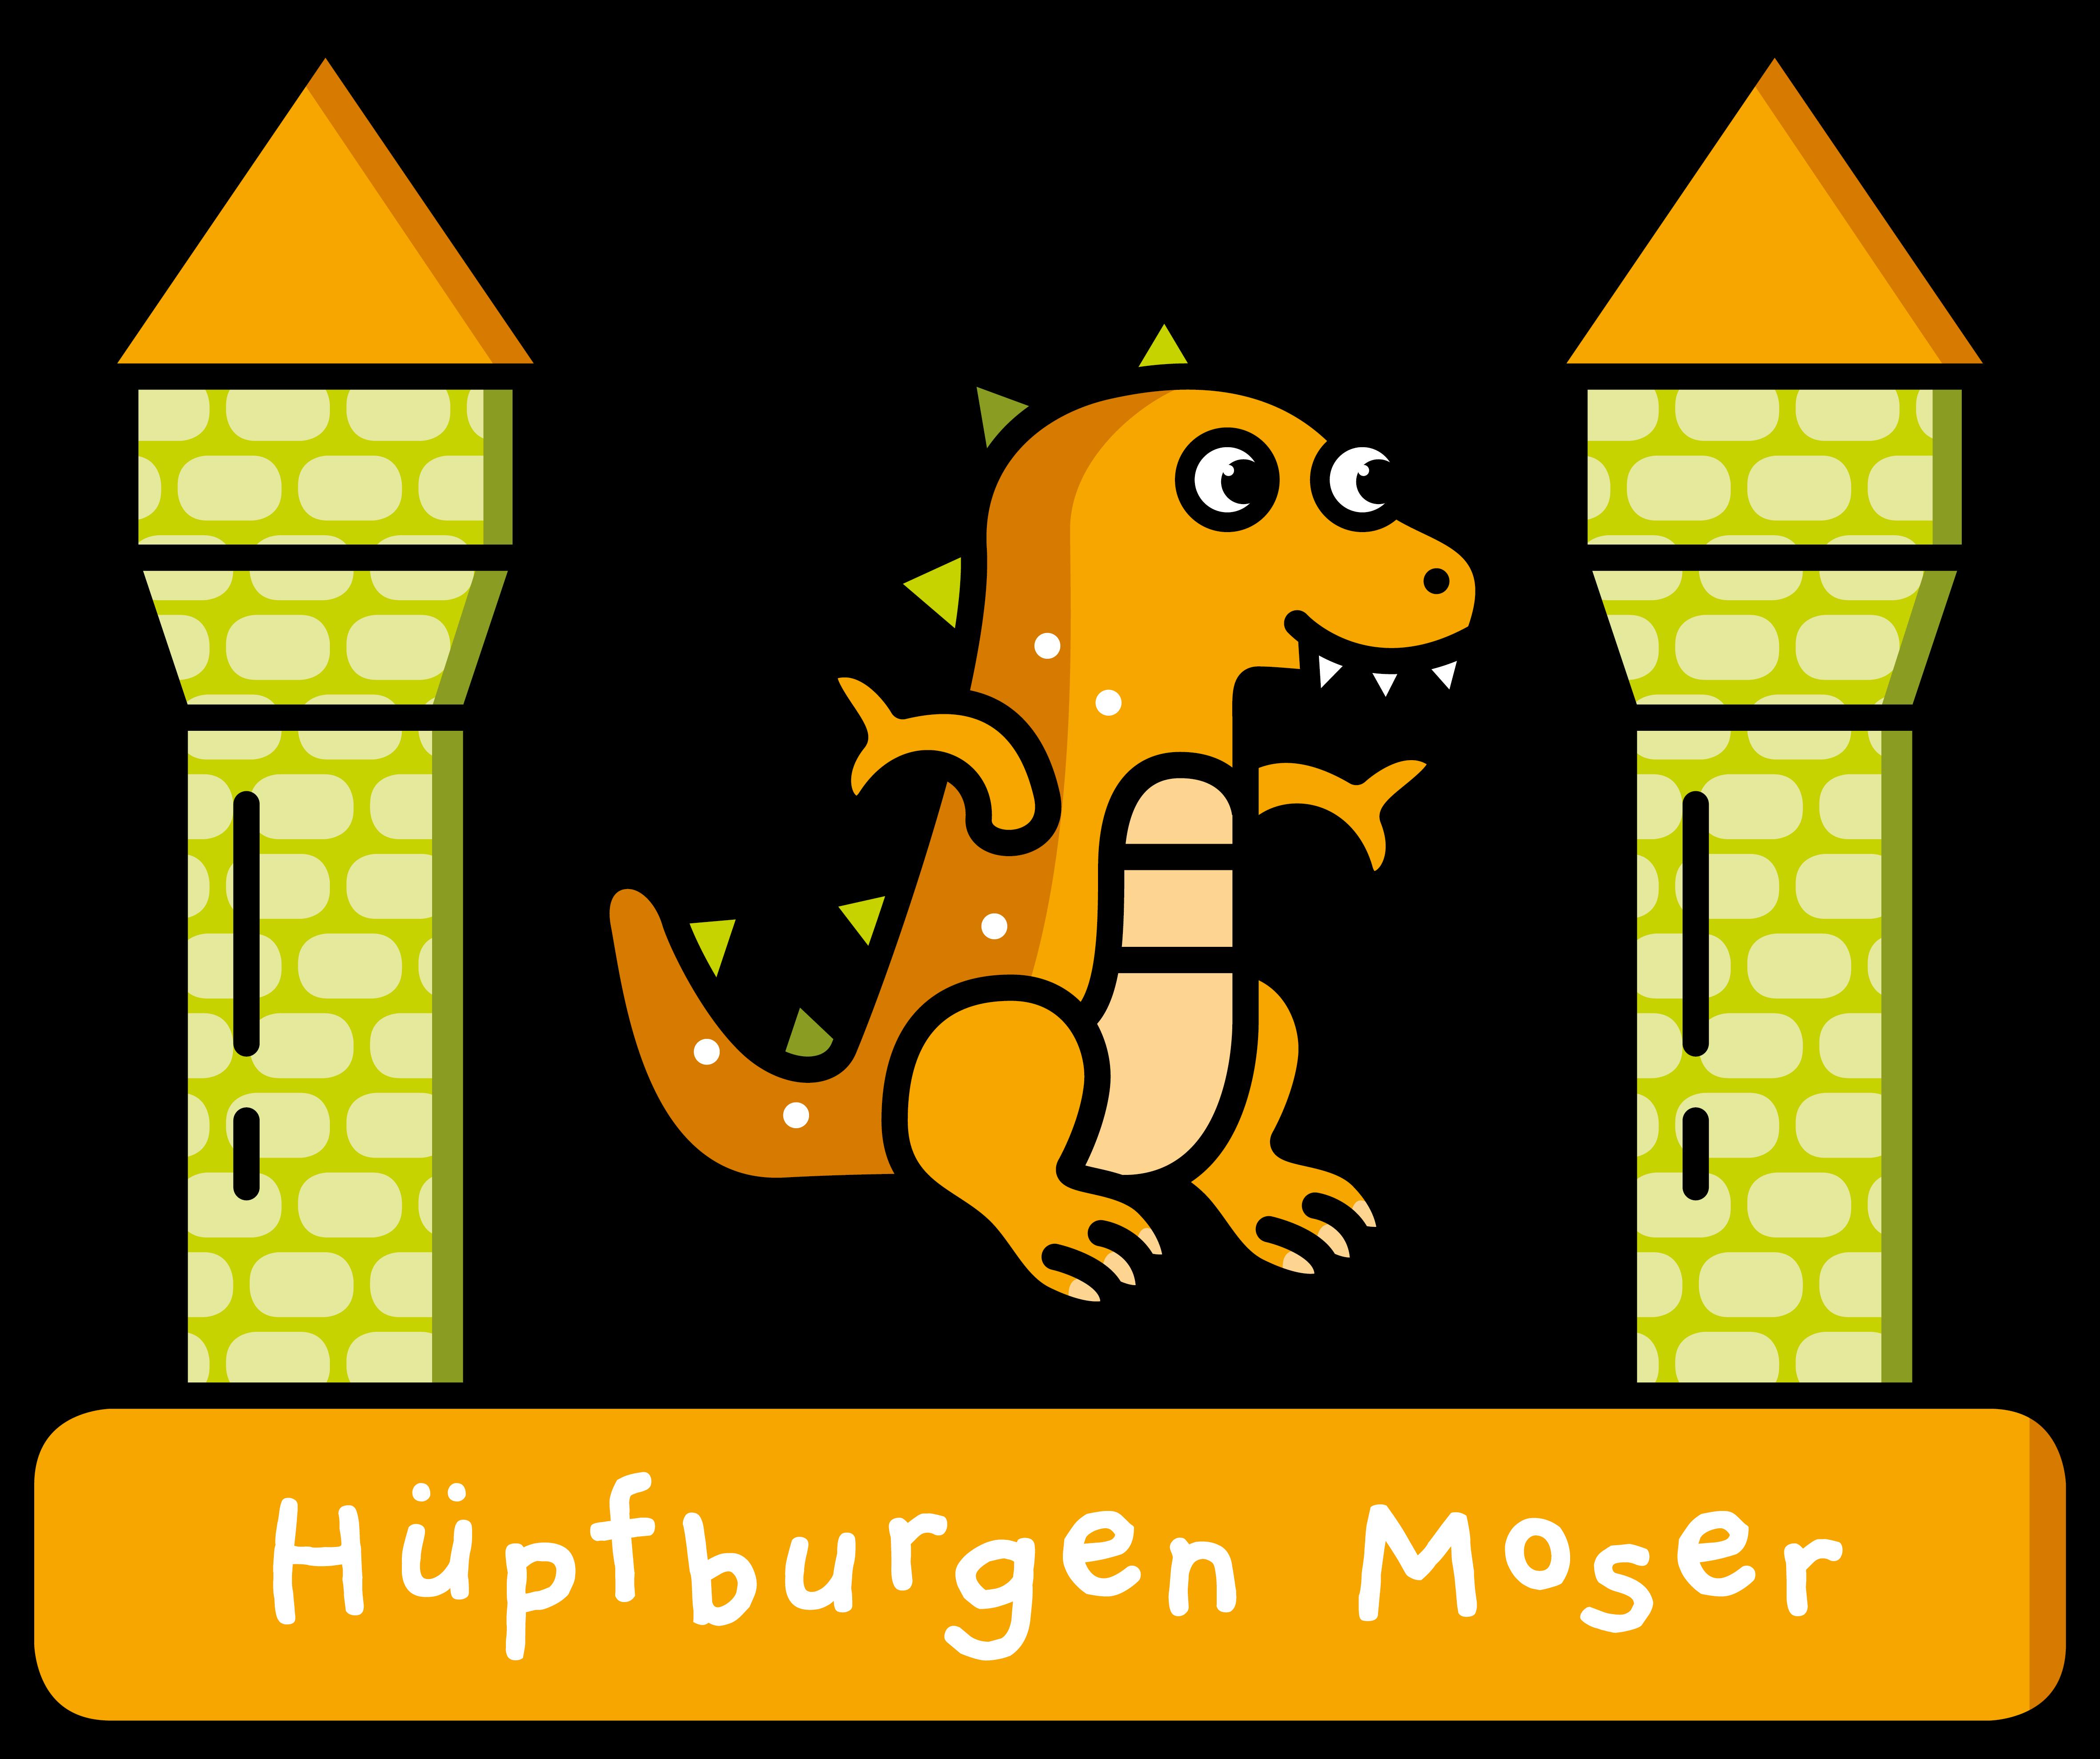 Hüpfburgen Moser